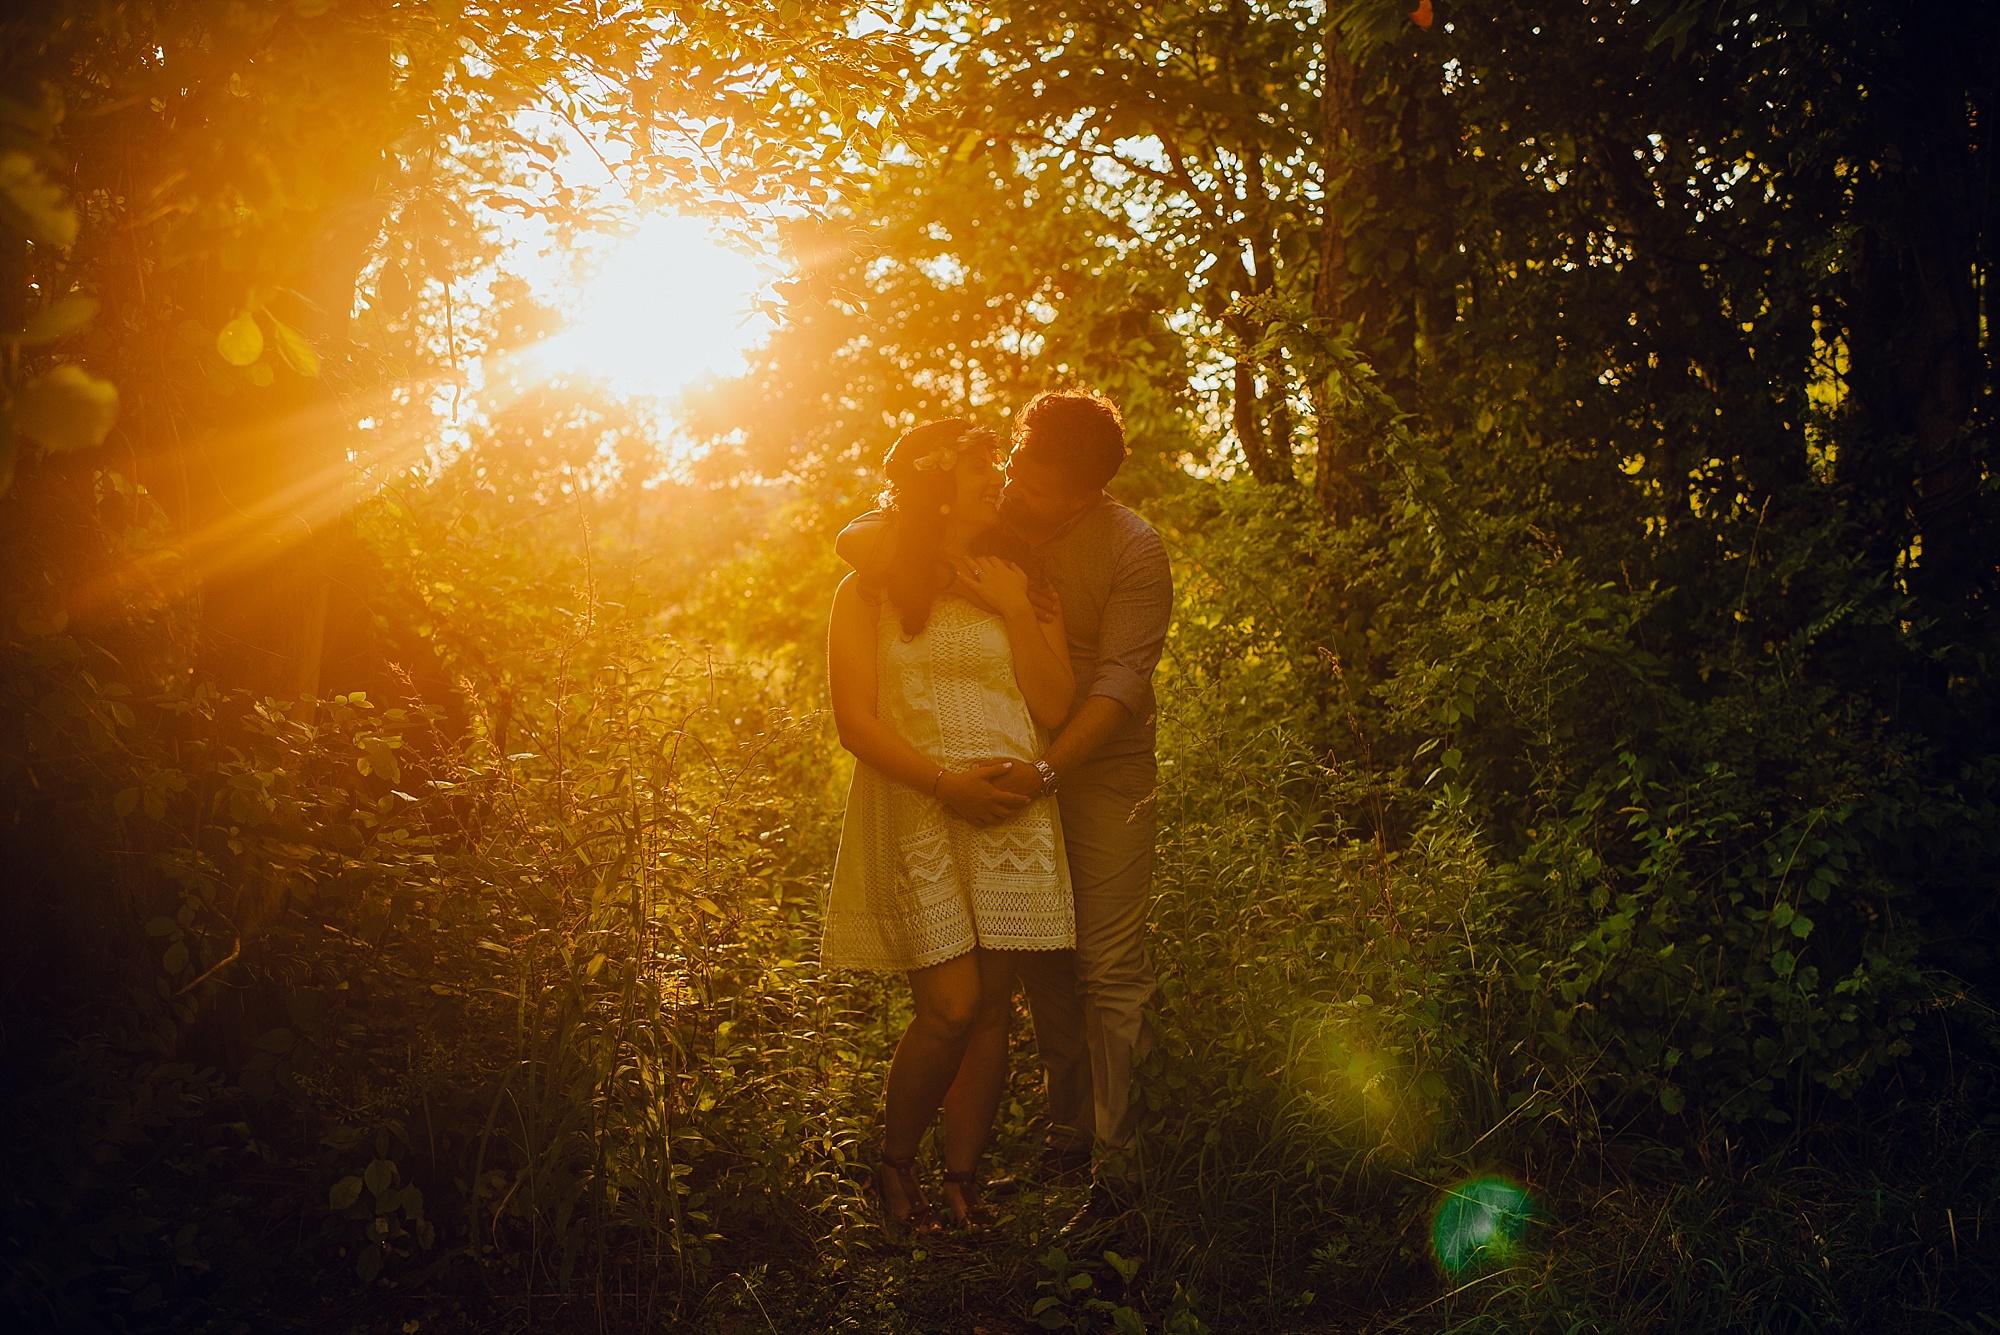 lauren-grayson-photography-cleveland-ohio-photographer-maternity-summer-outdoor-bohemian-fields-session_0498.jpg